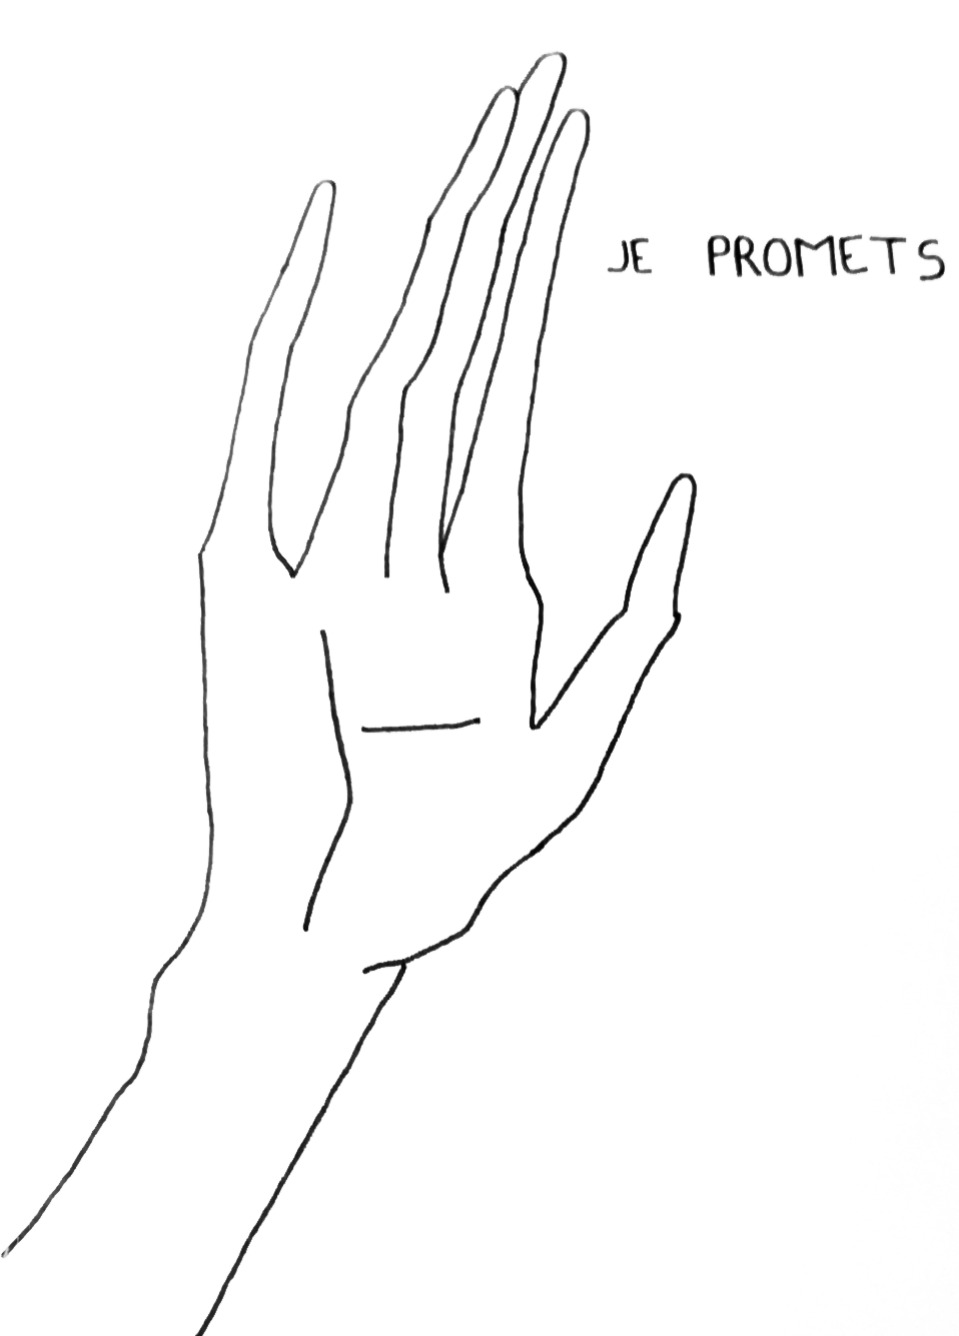 Promesse, 2018